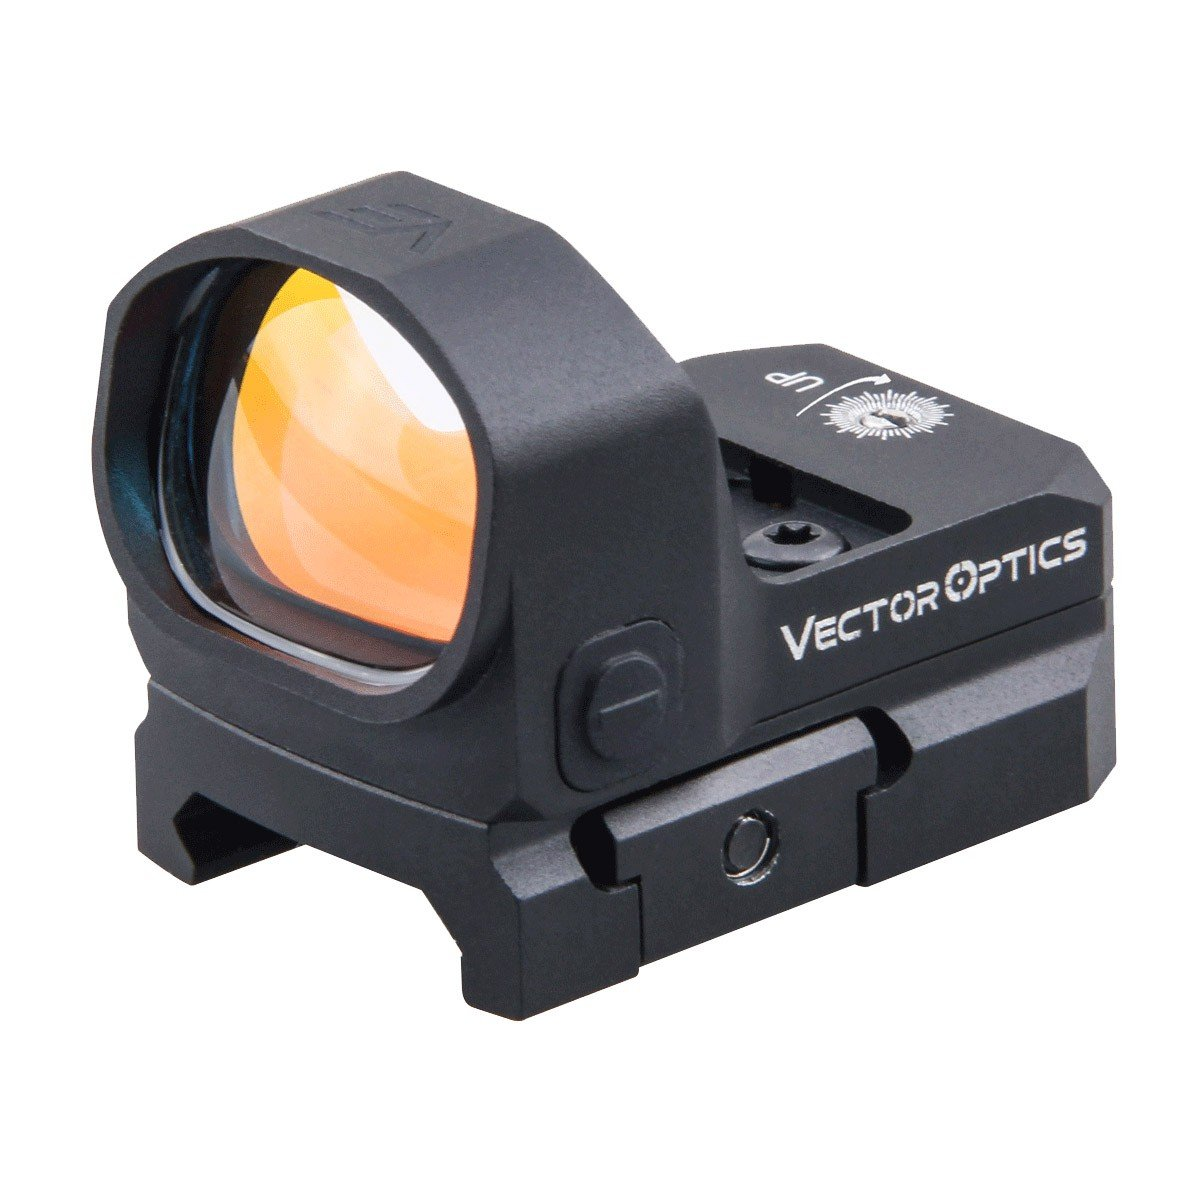 Vector Optics Frenzy ll 1x20x28 mm Red Dot Sight: Not includes battery(SCRD-35)